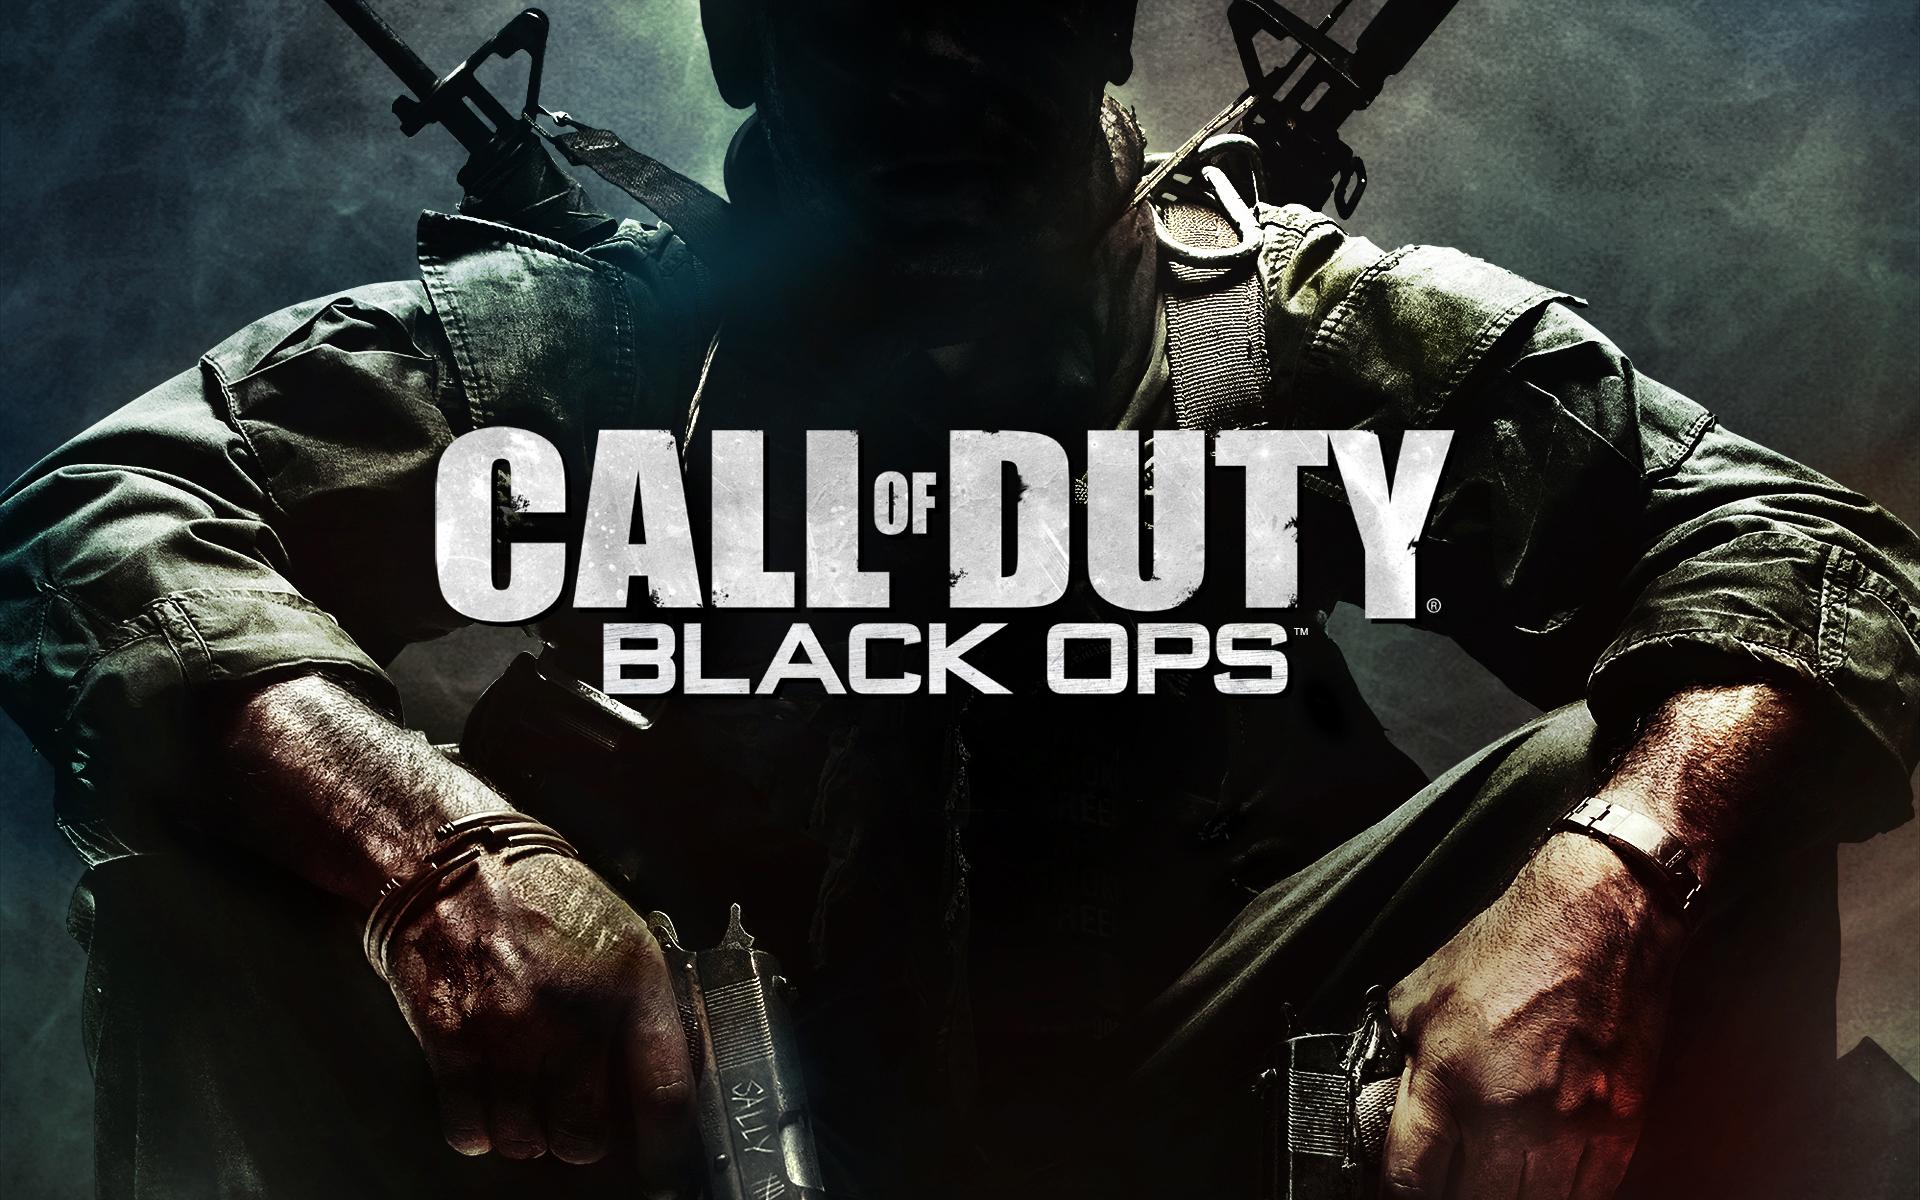 call of duty black ops wallpaper desktop #h988417 | games hd